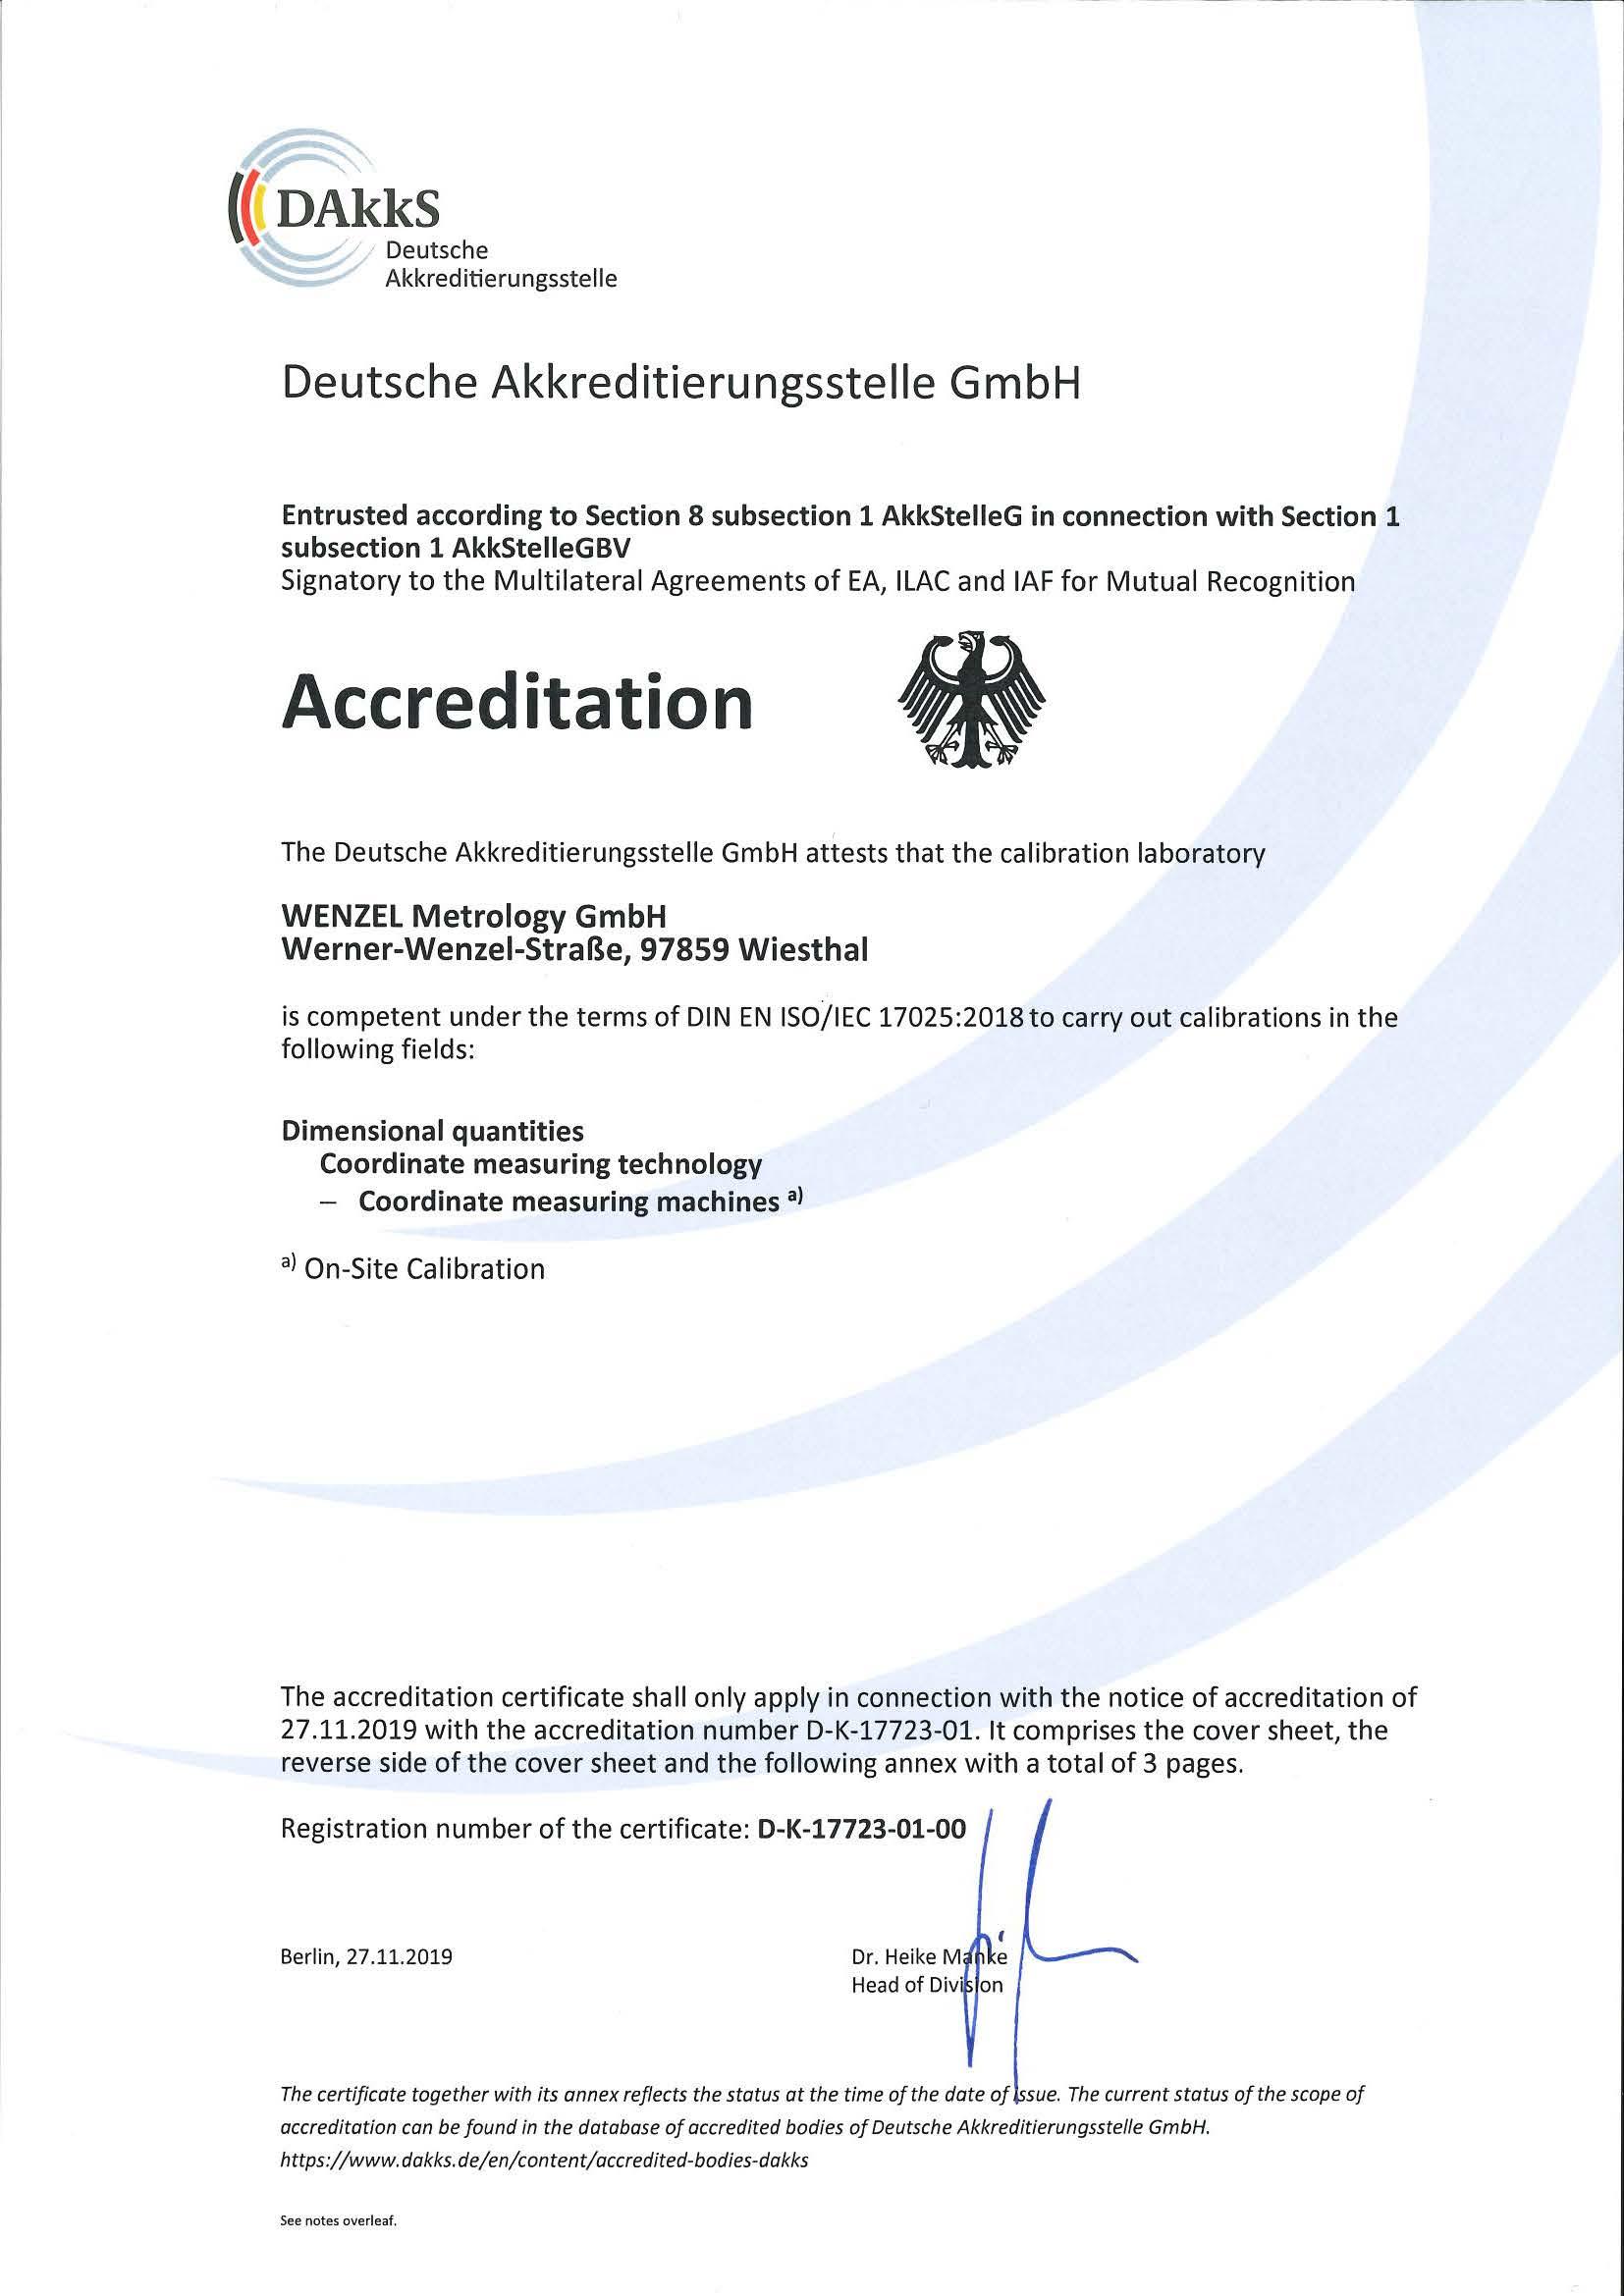 Accreditaton certificate_D-K-17723-01-00_27.11.2019_Stránka_1